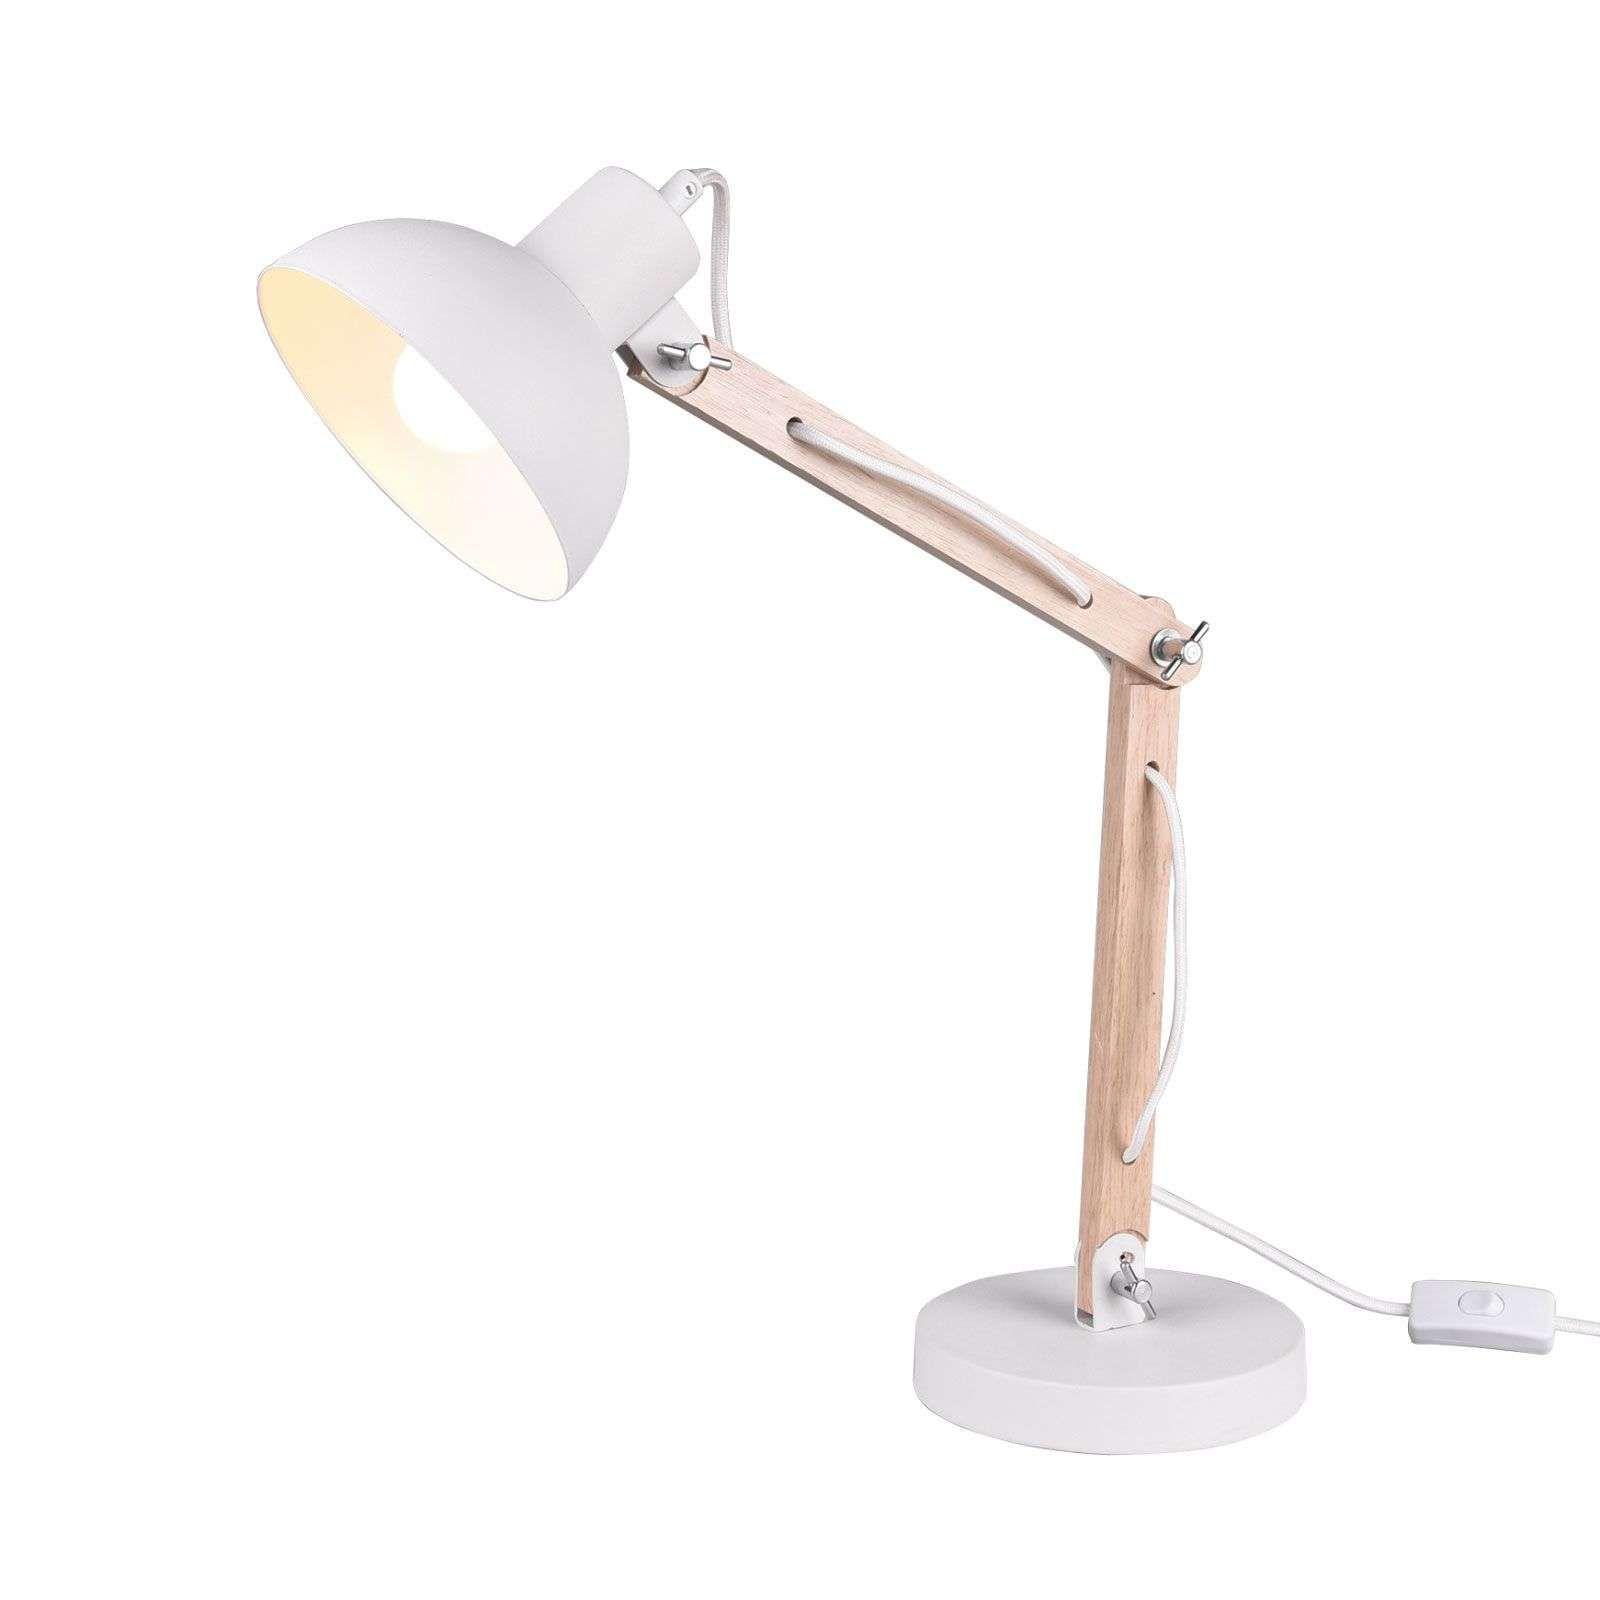 Tischleuchte Kimi Weiss En 2020 Lampe A Poser Luminaire Lamp